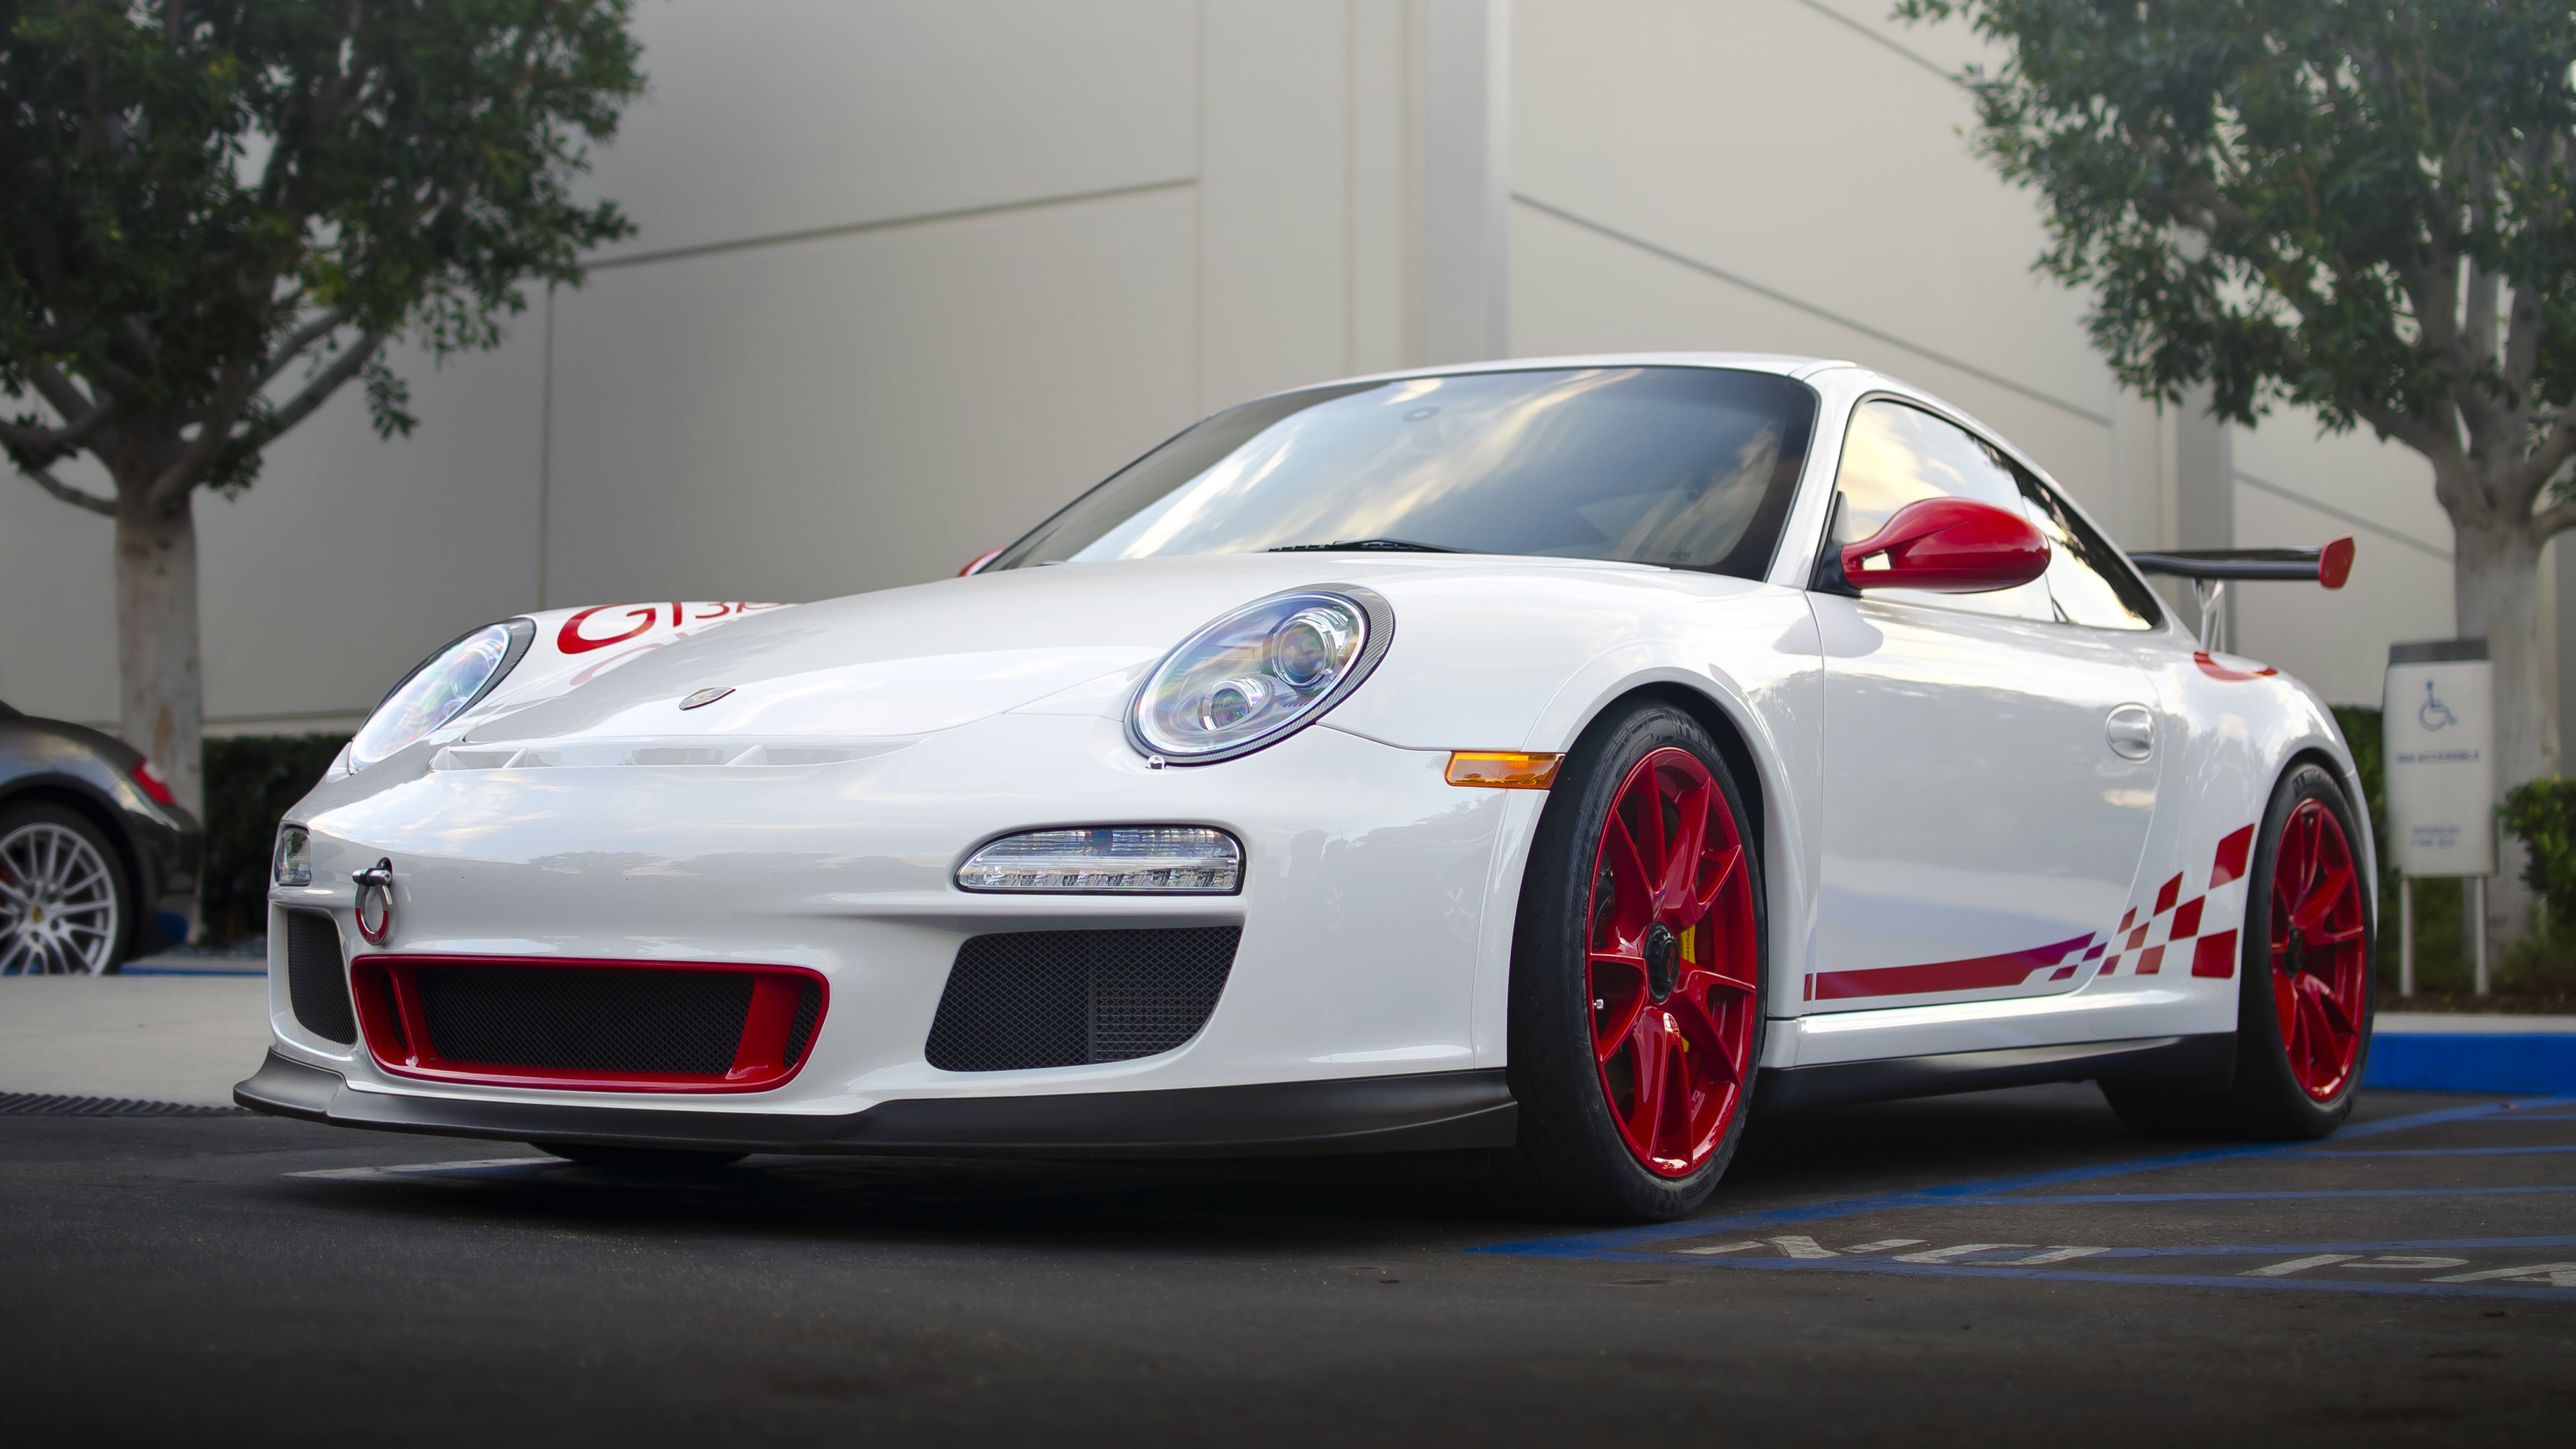 Sport Wallpaper Porsche 911: Porsche 911 Wallpapers, Pictures, Images